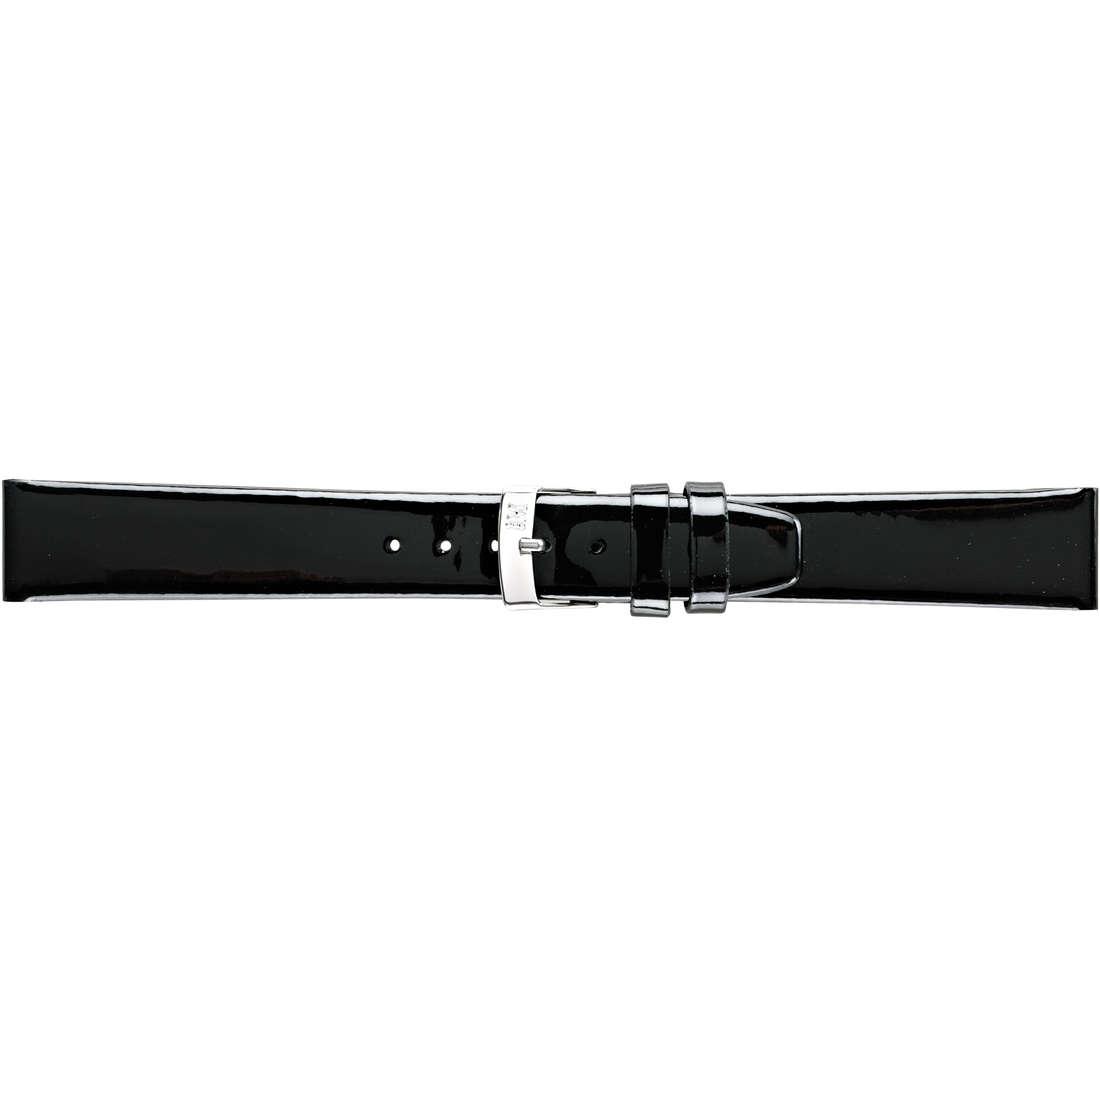 watch watch bands watch straps woman Morellato Morellato 1930 A01D3642A28019CR16